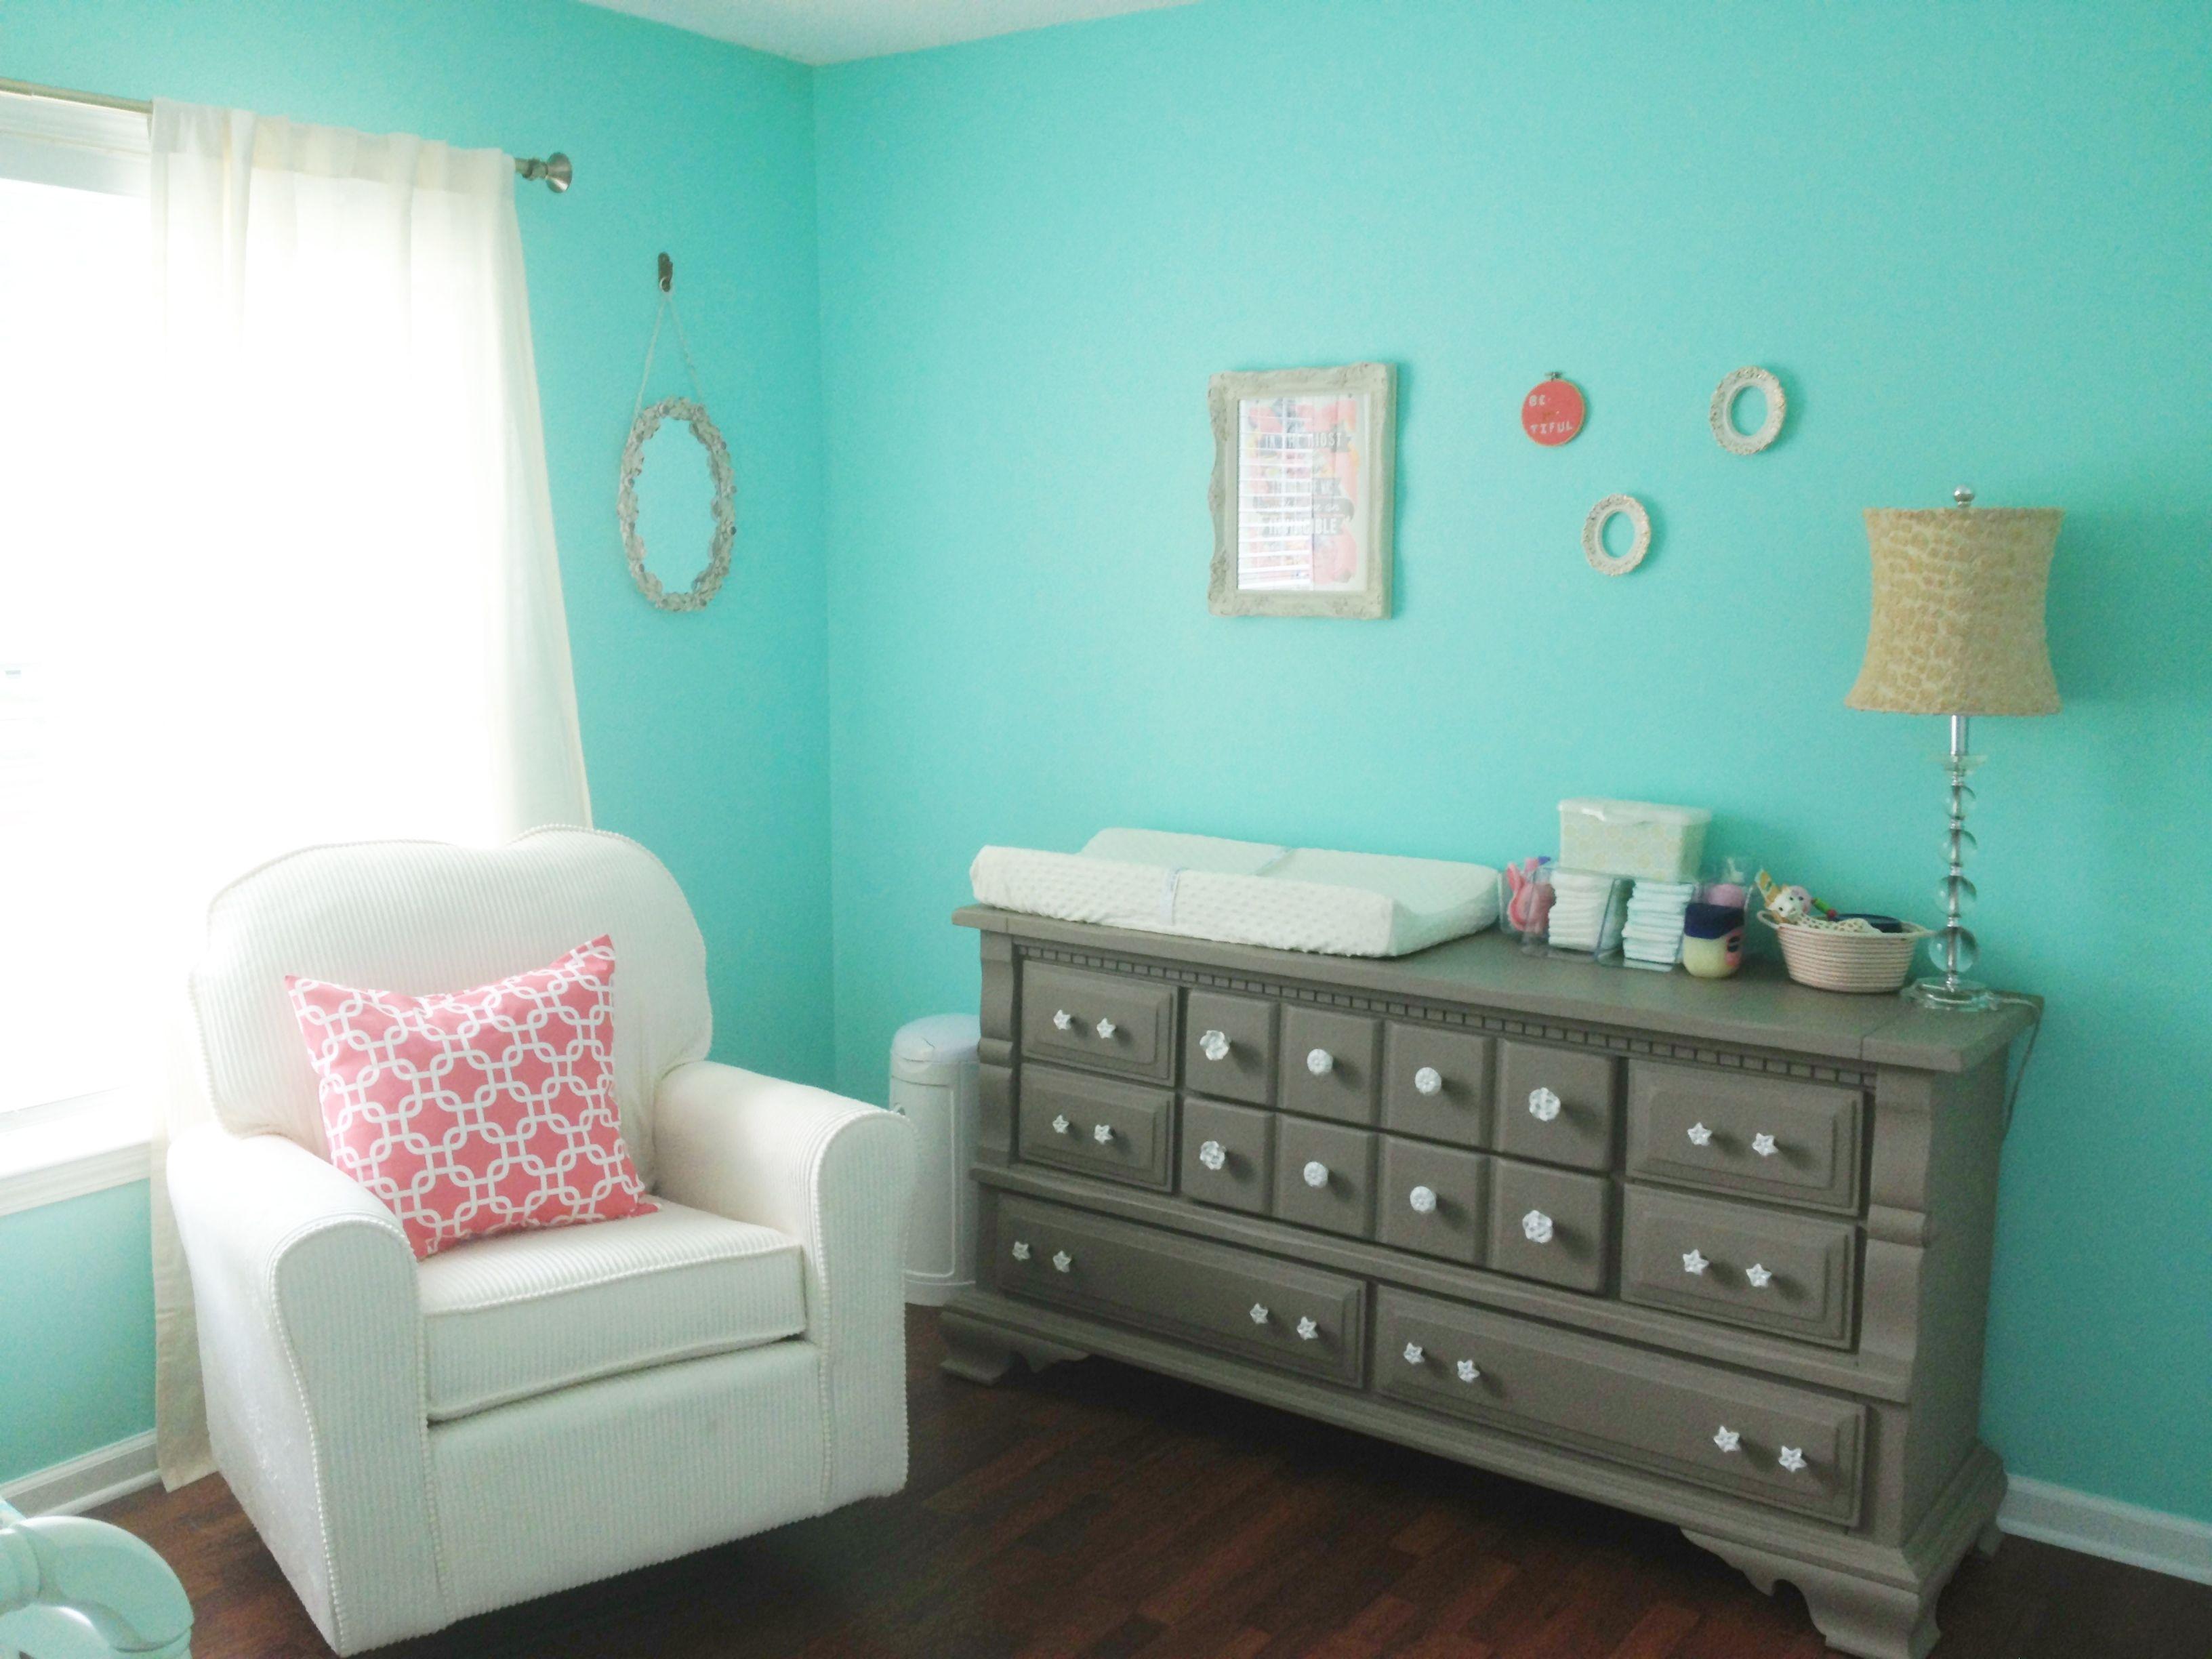 Paint Colors Turquoise Risultati Immagini Per Aqua Color Nursery Ideas Kids Bedroom